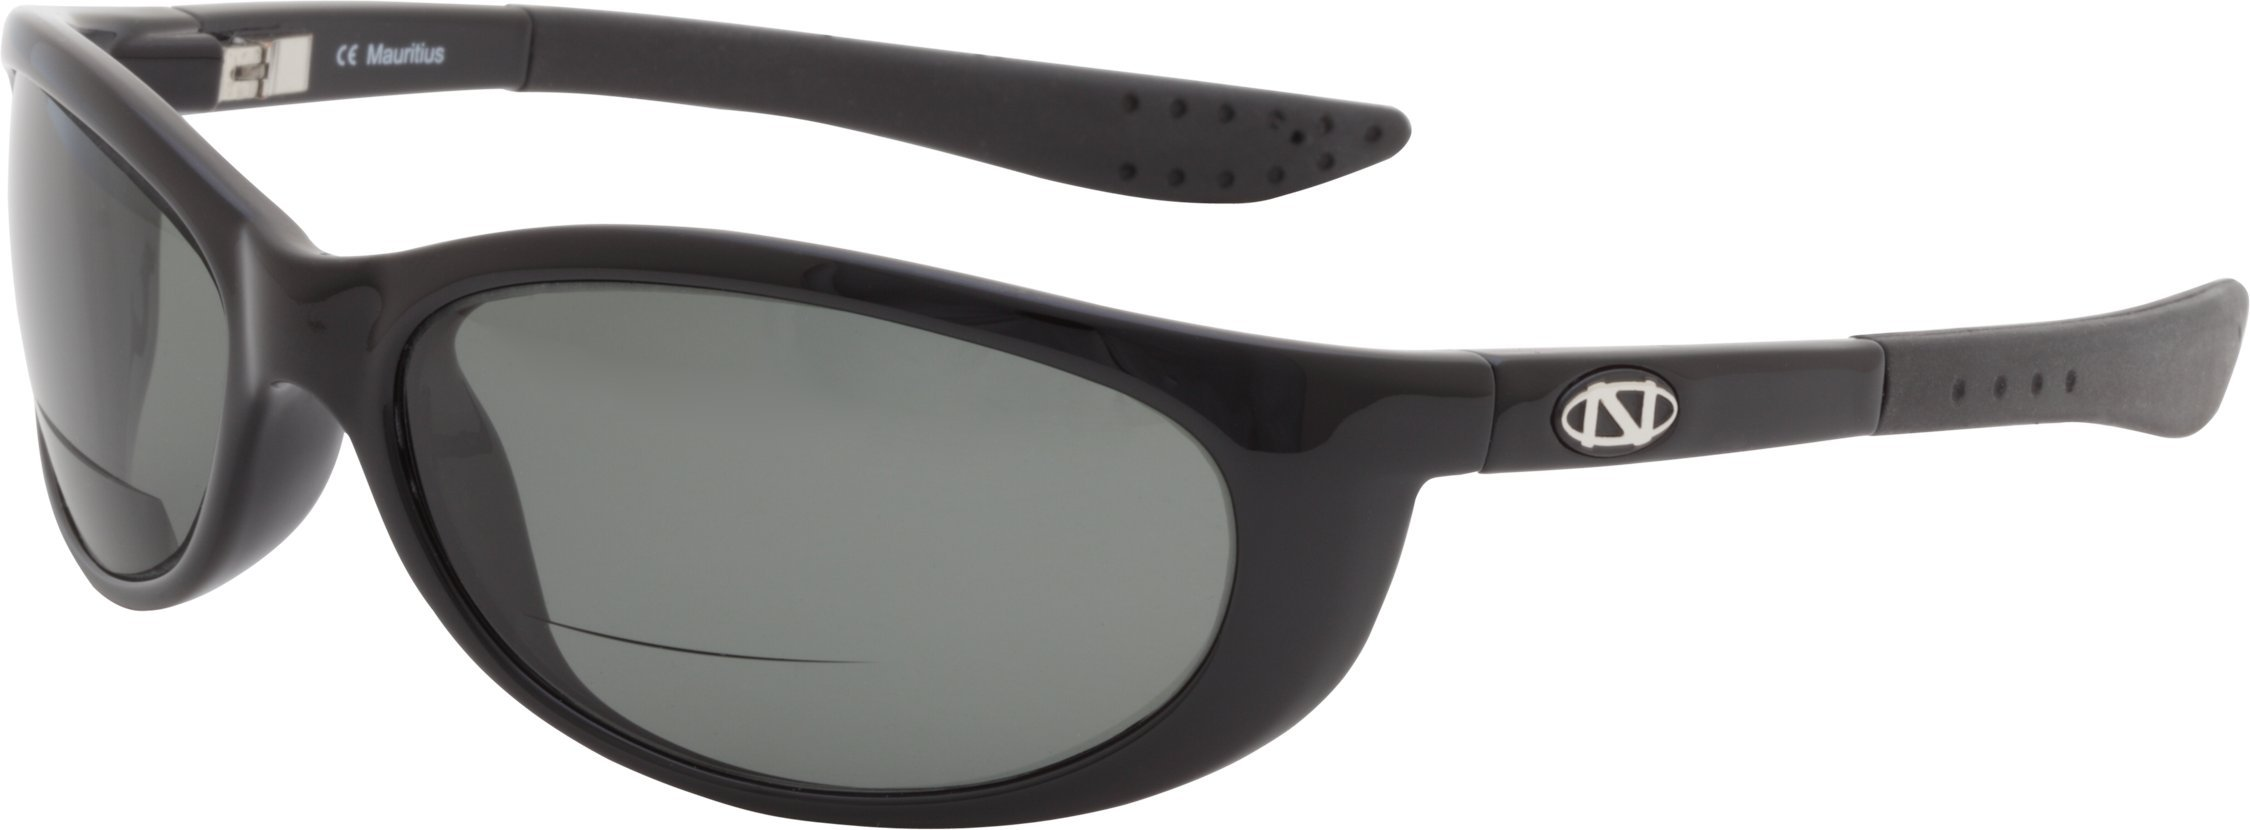 ONOS Petit Boy Polarized Sunglasses (+1.5 Add Power), Black, Grey